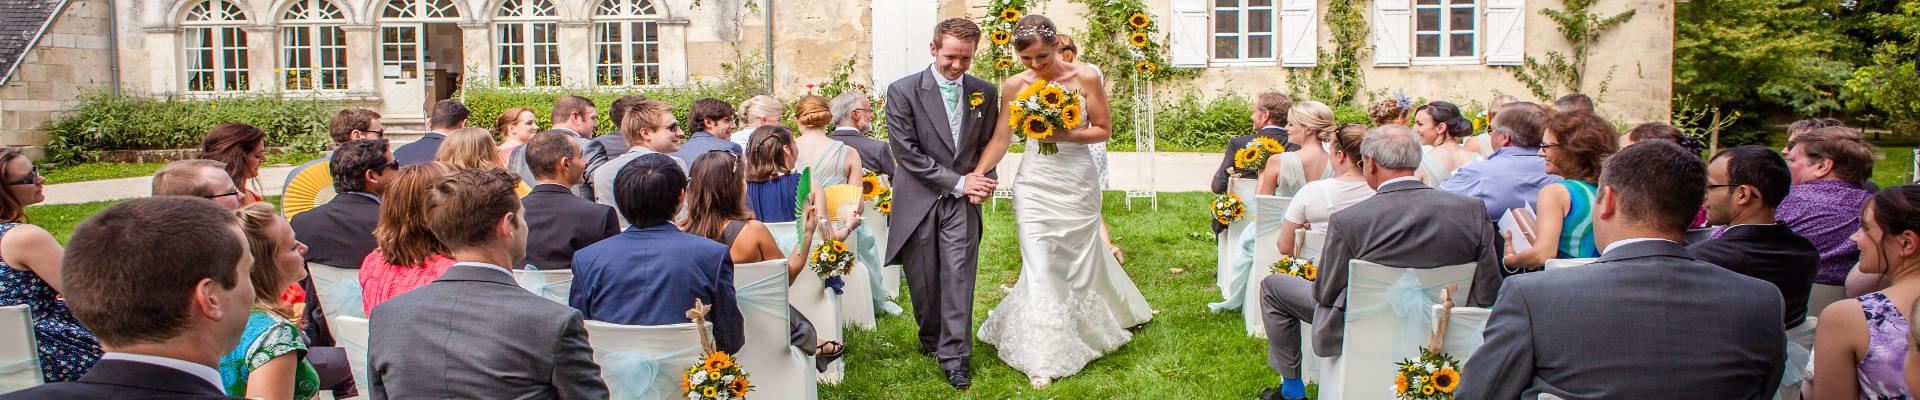 wedding ceremony in france - wedding celebrants in france - wedding planners